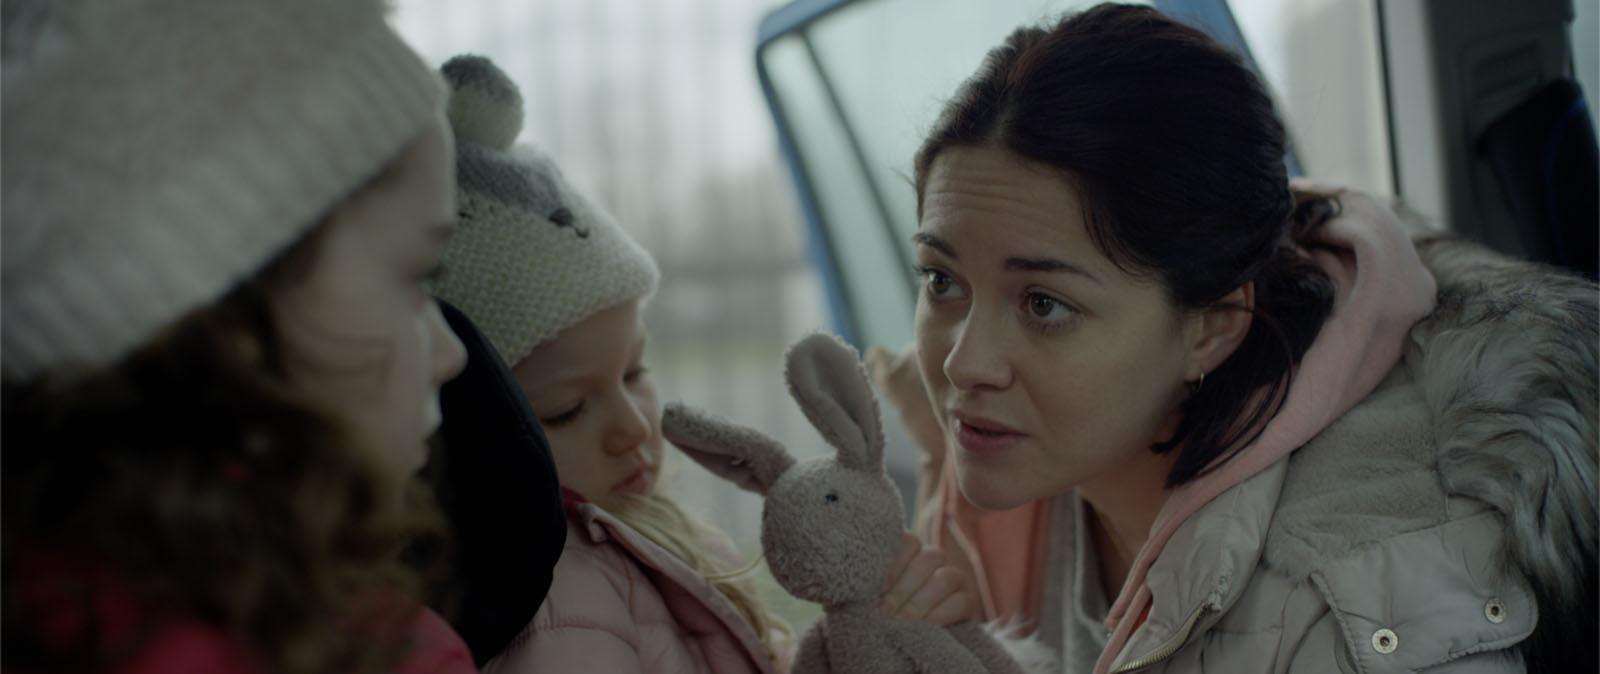 Rosie (2018) Online Subtitrat in Romana in HD 1080p